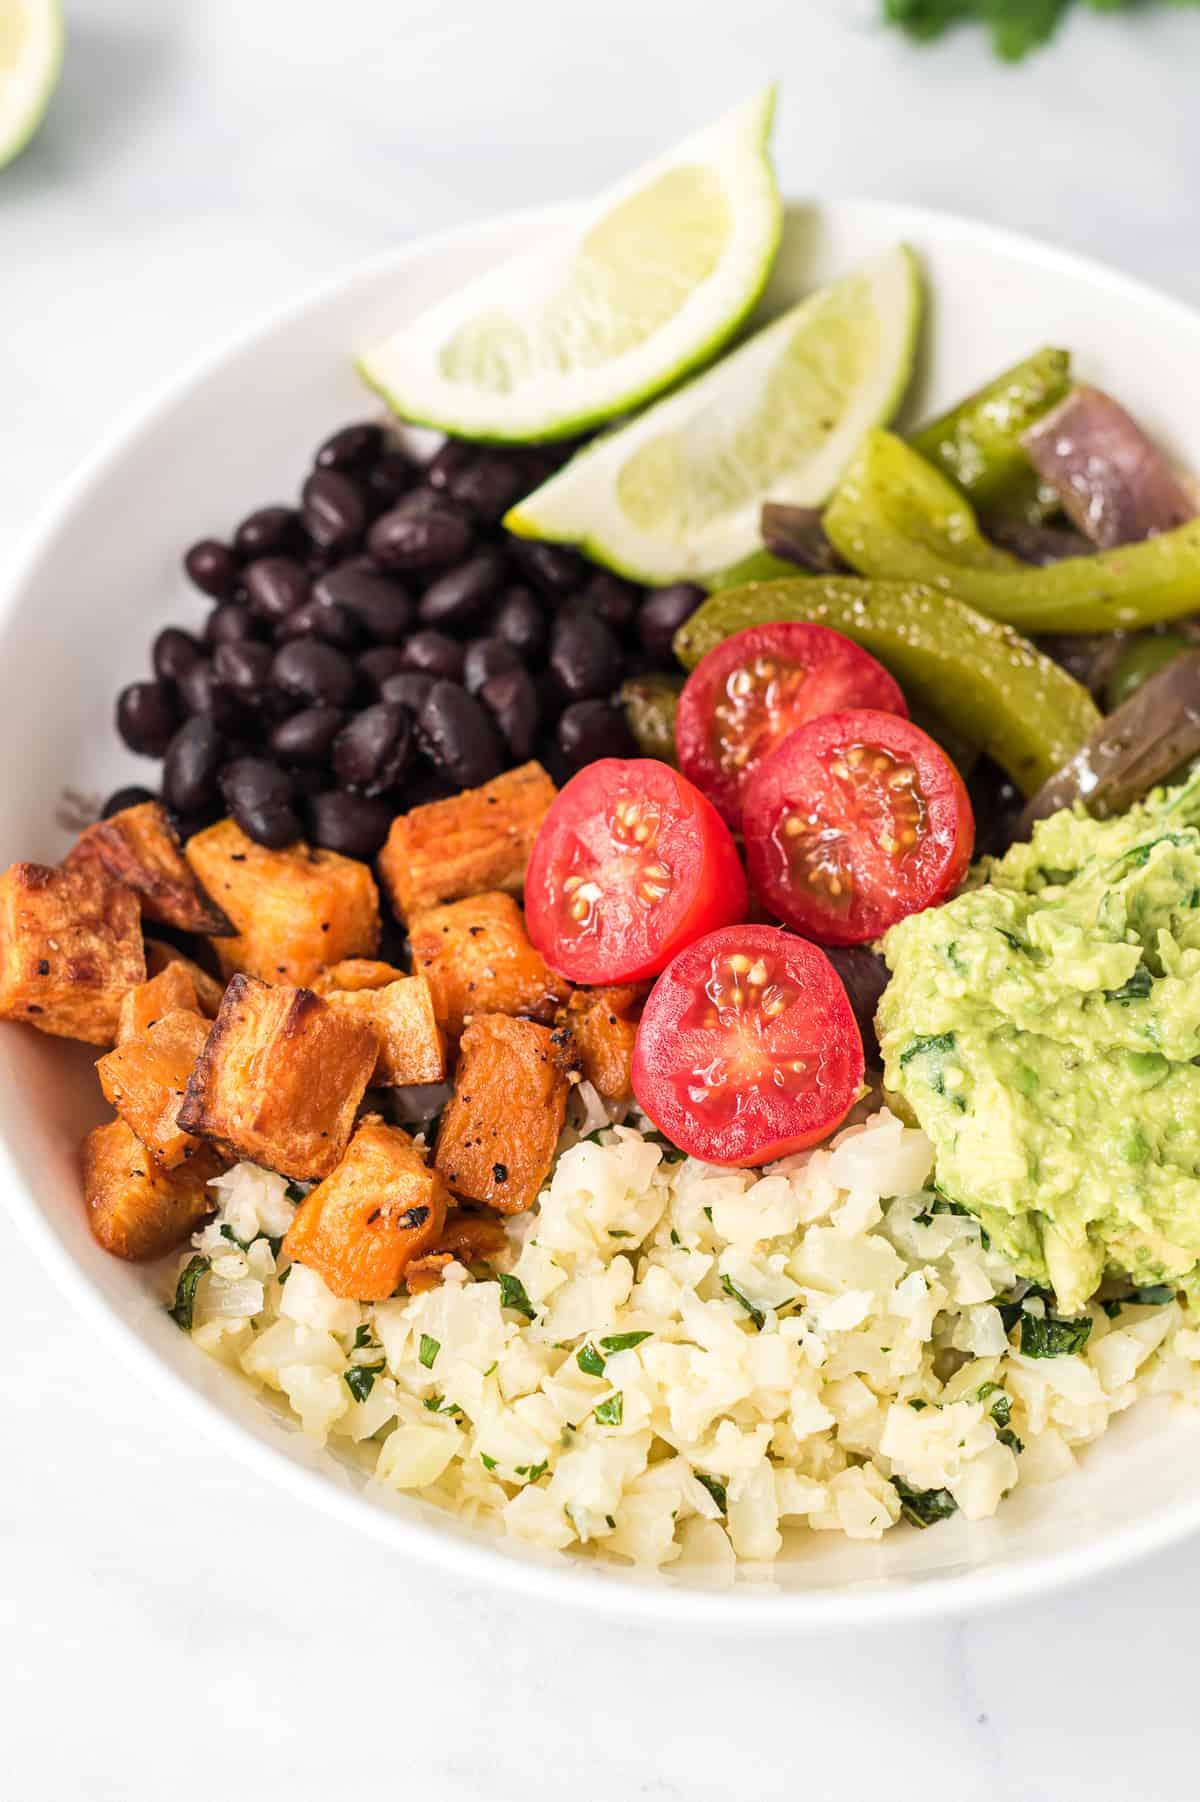 cauliflower rice burrito bowl with sweet potatoes, tomatoes, guacamole, fajita veggies, and black beans